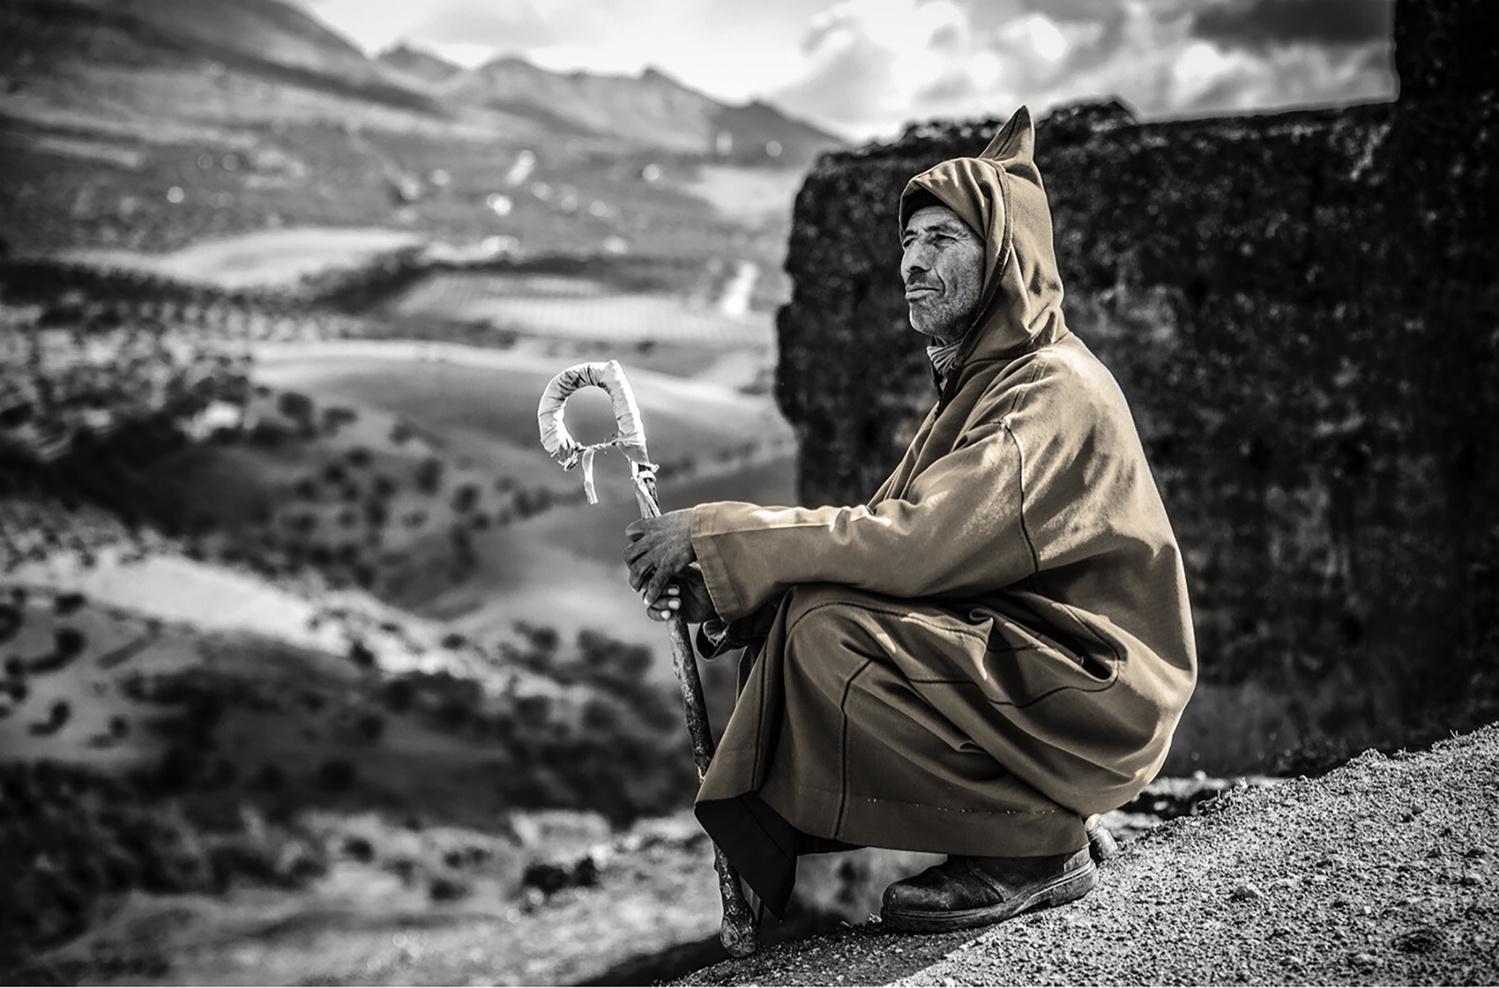 The Berber by Dieter Kaupp